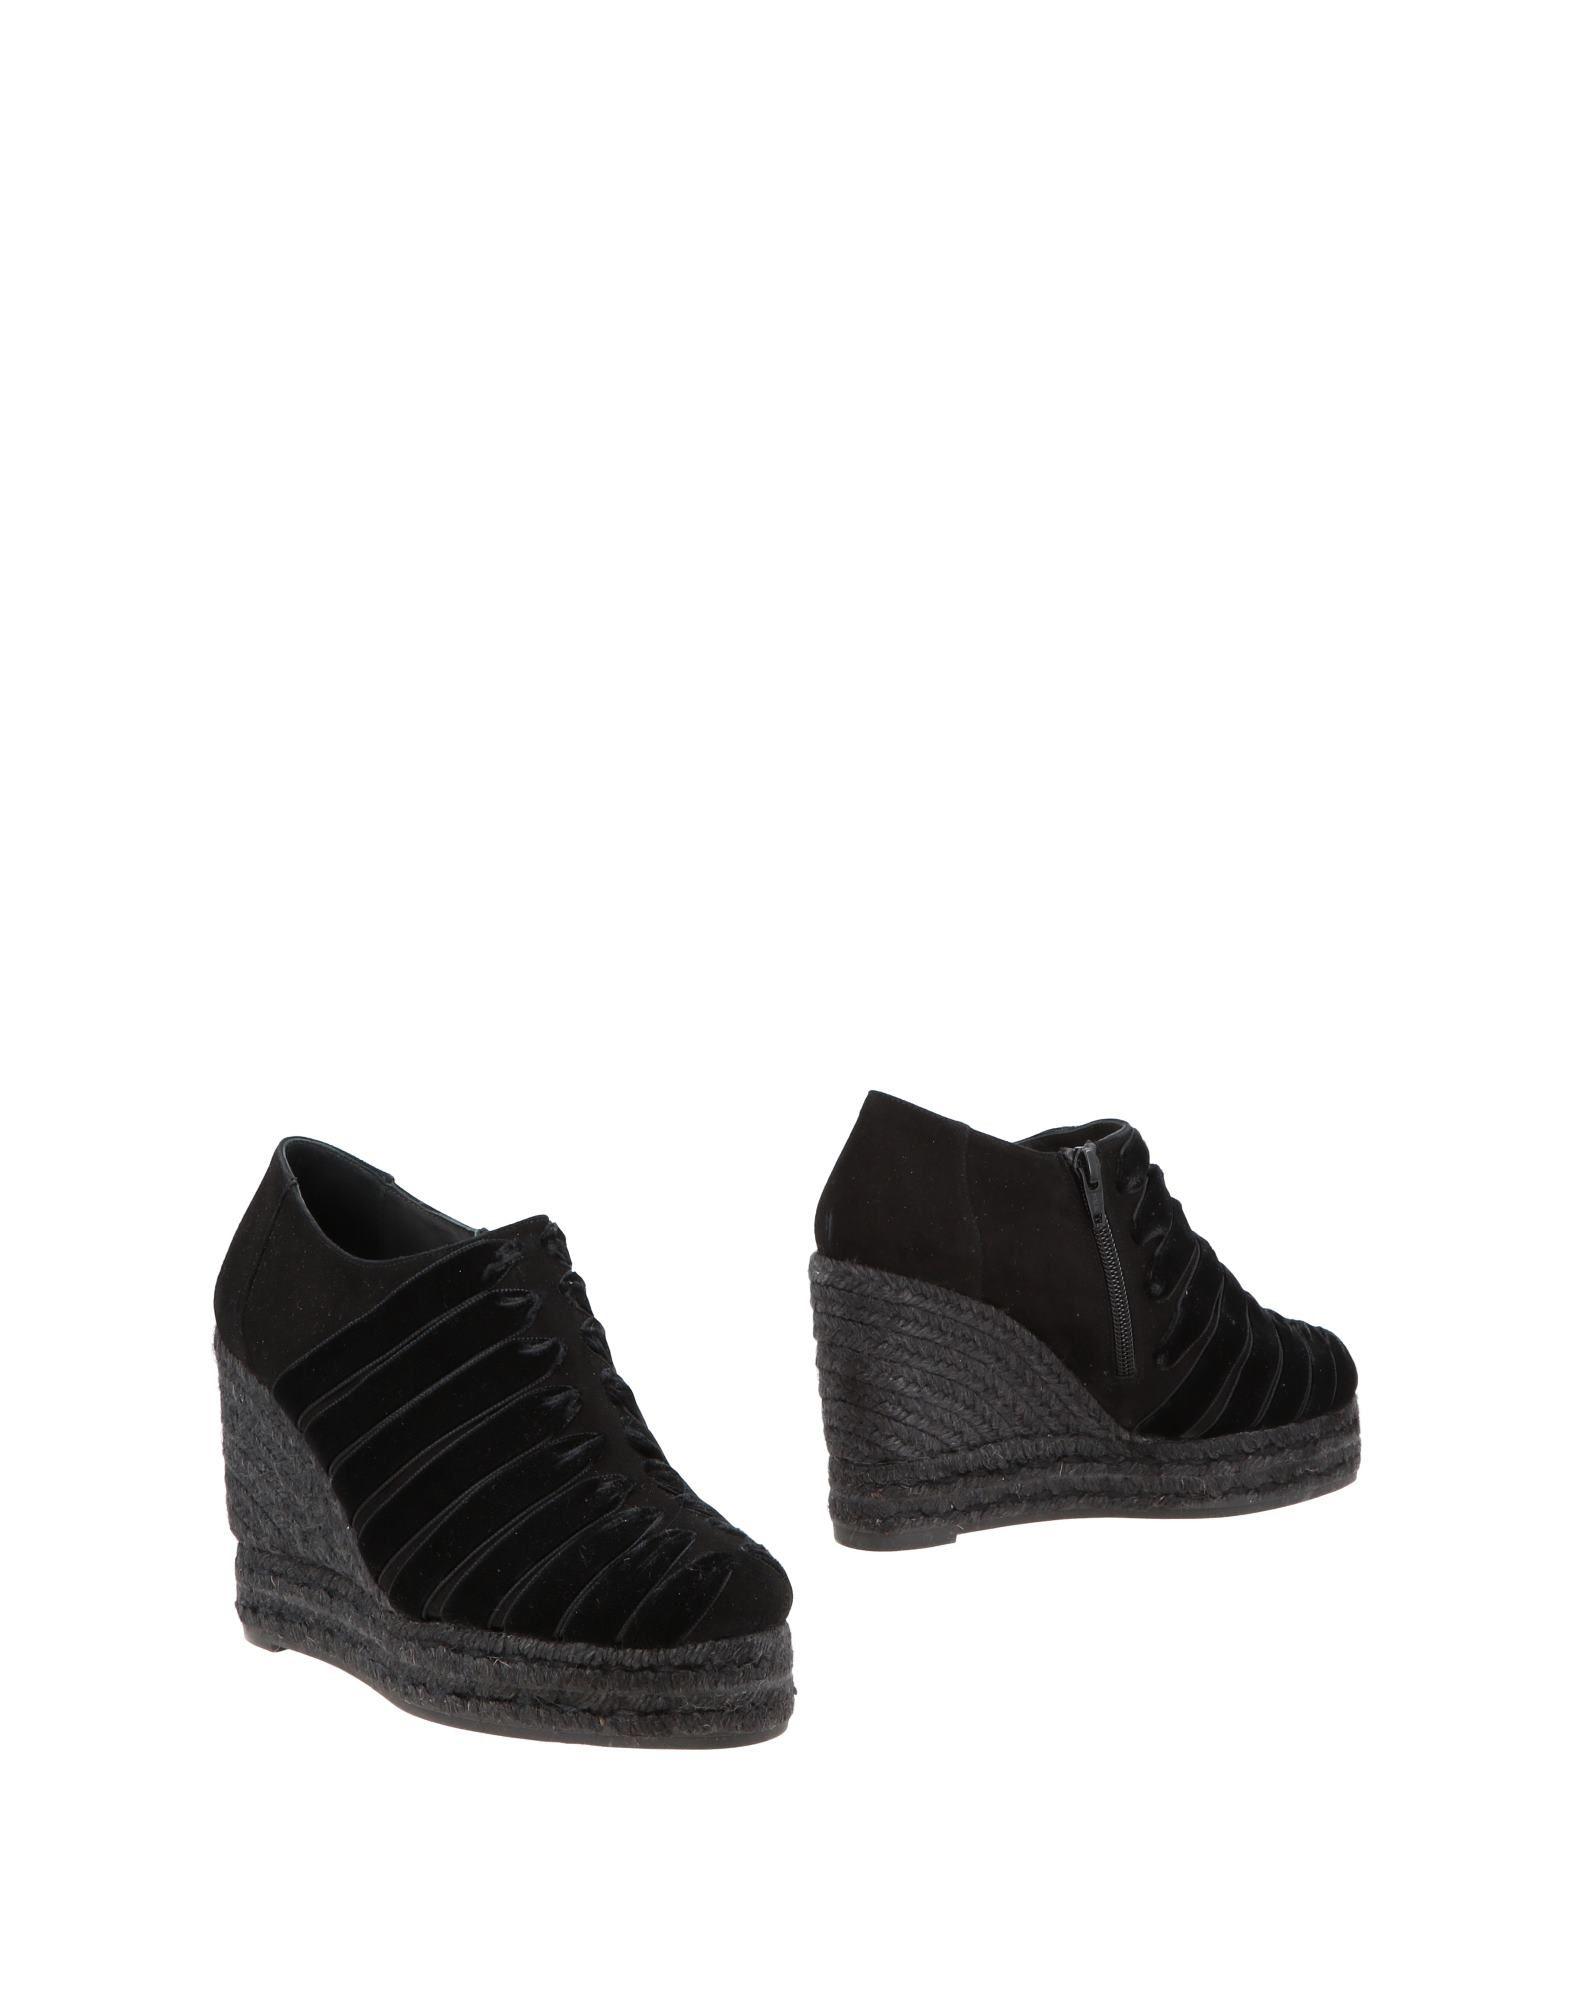 Castañer Gute Stiefelette Damen  11492721RO Gute Castañer Qualität beliebte Schuhe fda842